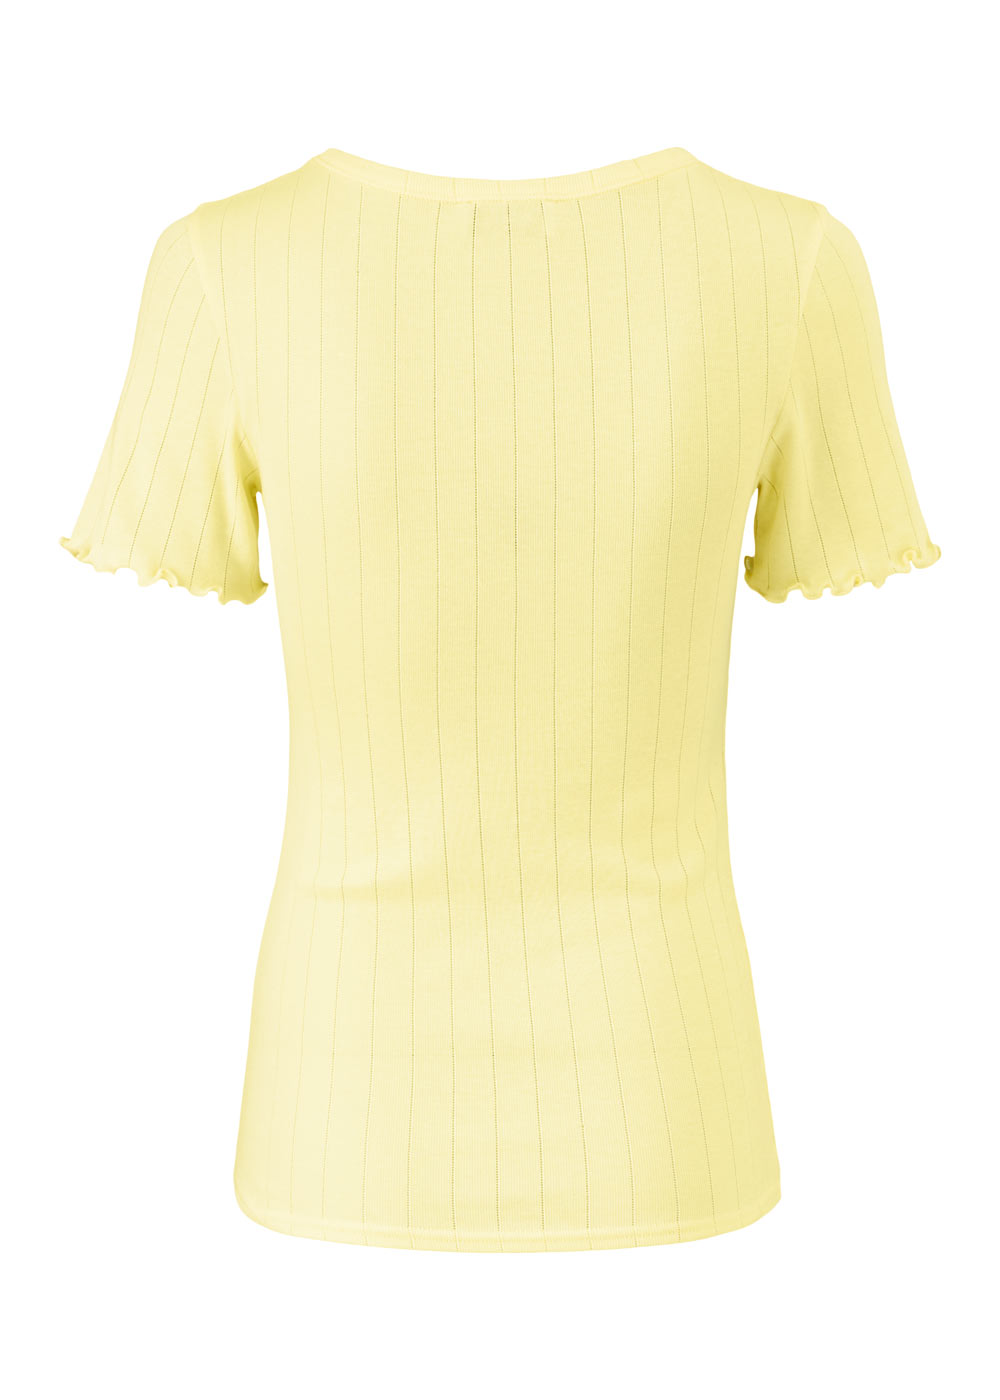 Modström Issy t-shirt, lemon haze, medium